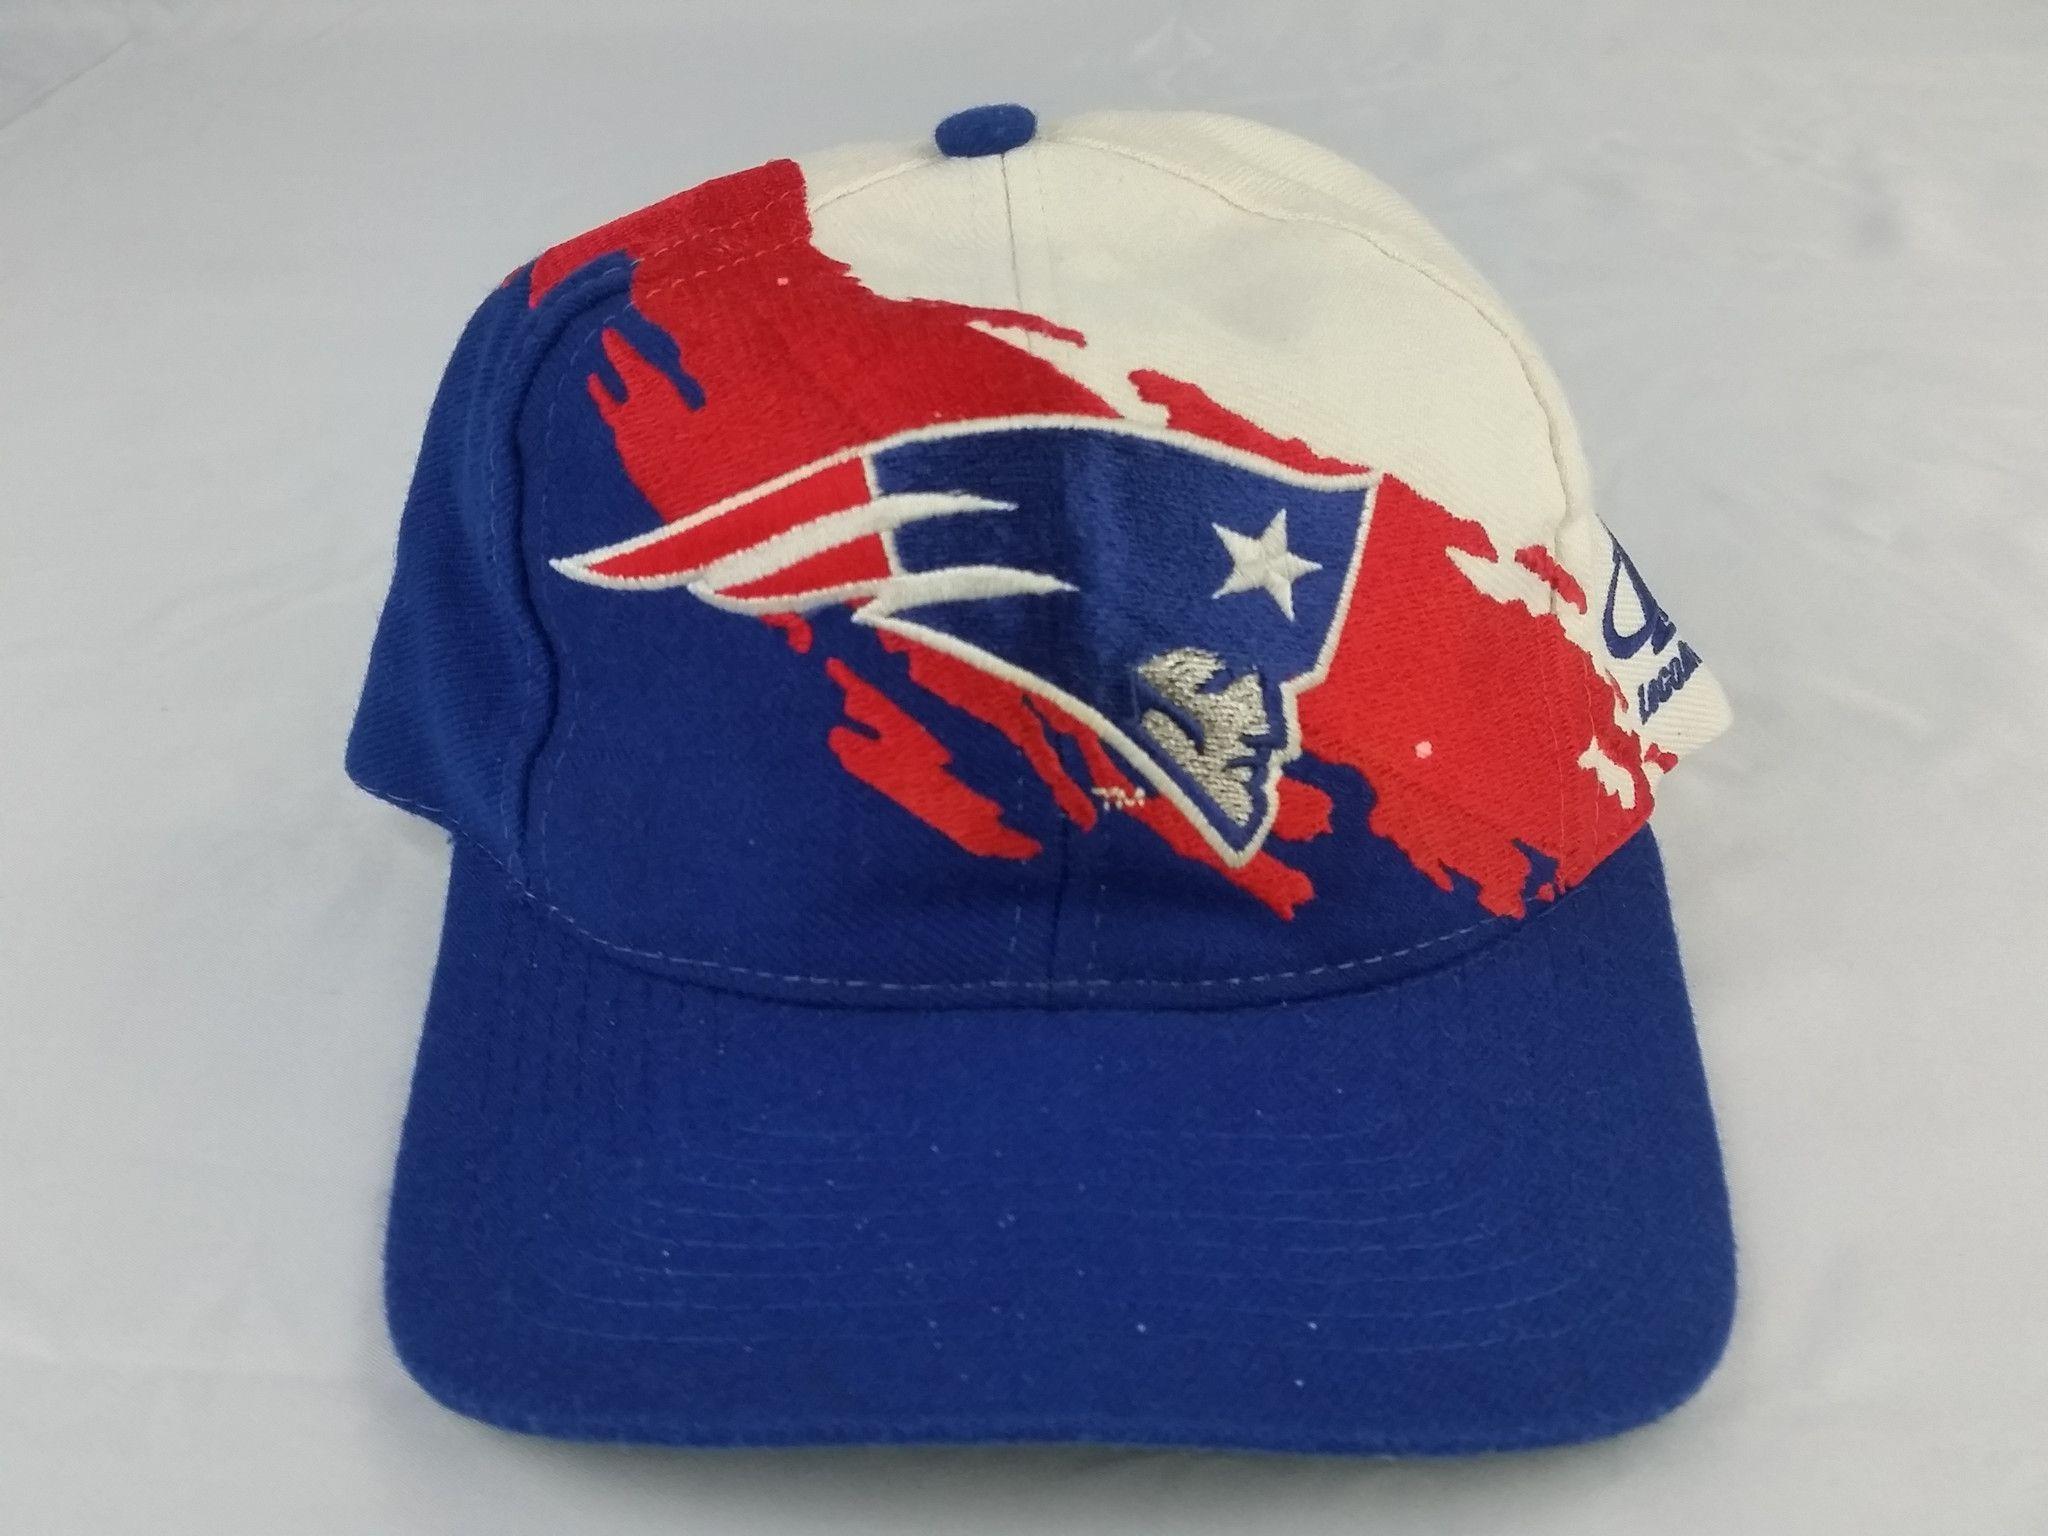 bf23a4e6f New England Patriots Vintage Snapback Logo Athletic Splash Hat NFL Pro Line  Cap